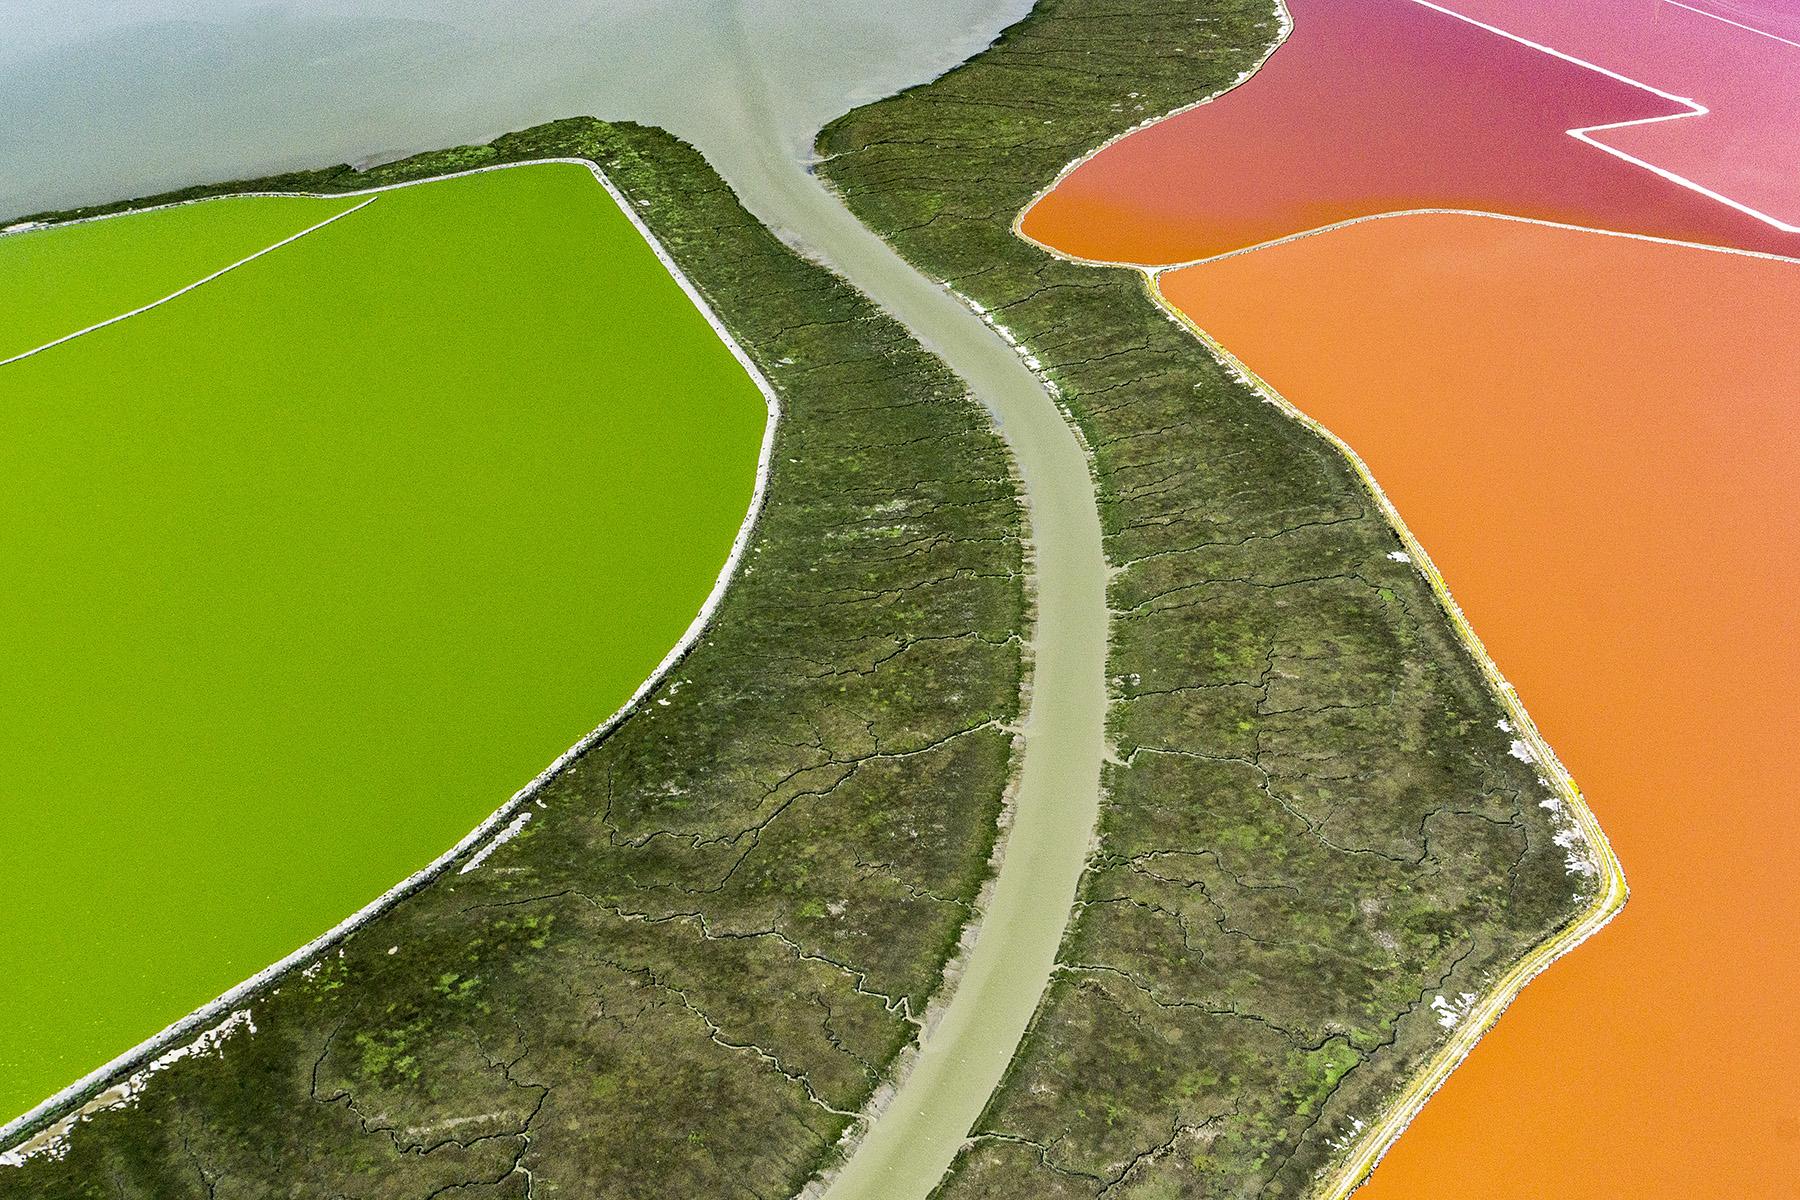 Colin_McRae_SF Bay Salt Ponds_ Green To Orange Two_1.jpg